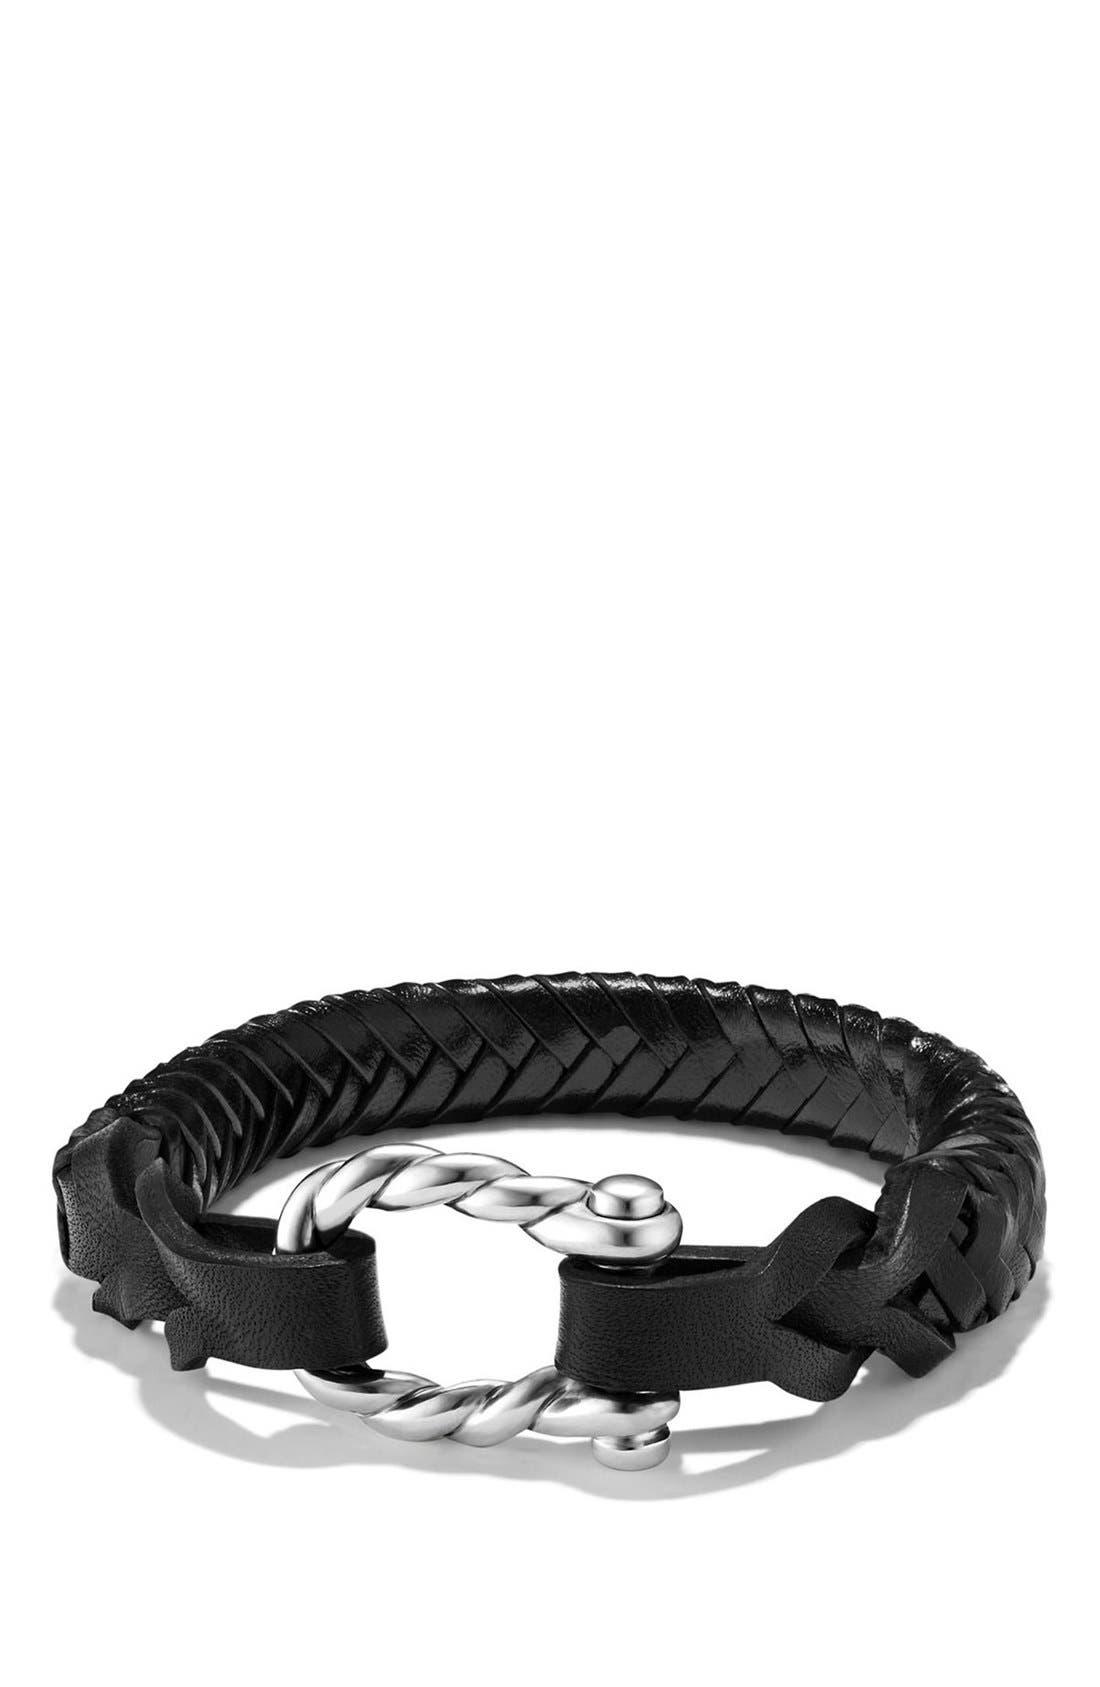 DAVID YURMAN 'Maritime' Leather Woven Shackle Bracelet, Main, color, SILVER/ BLACK